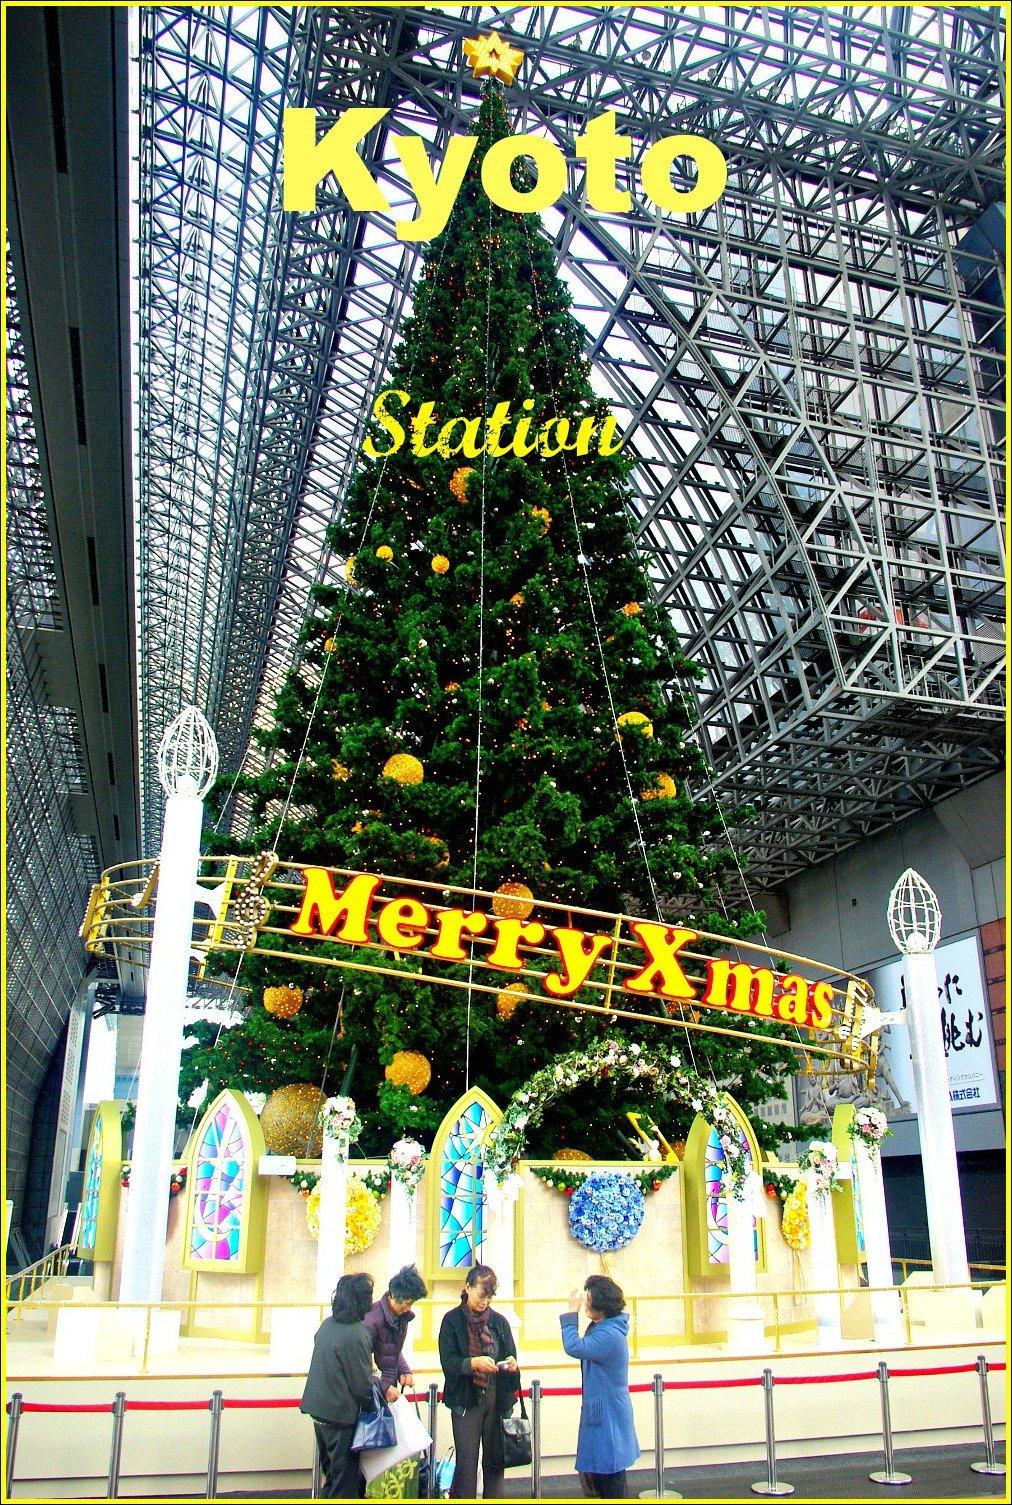 Kyoto Train Station and Christmas